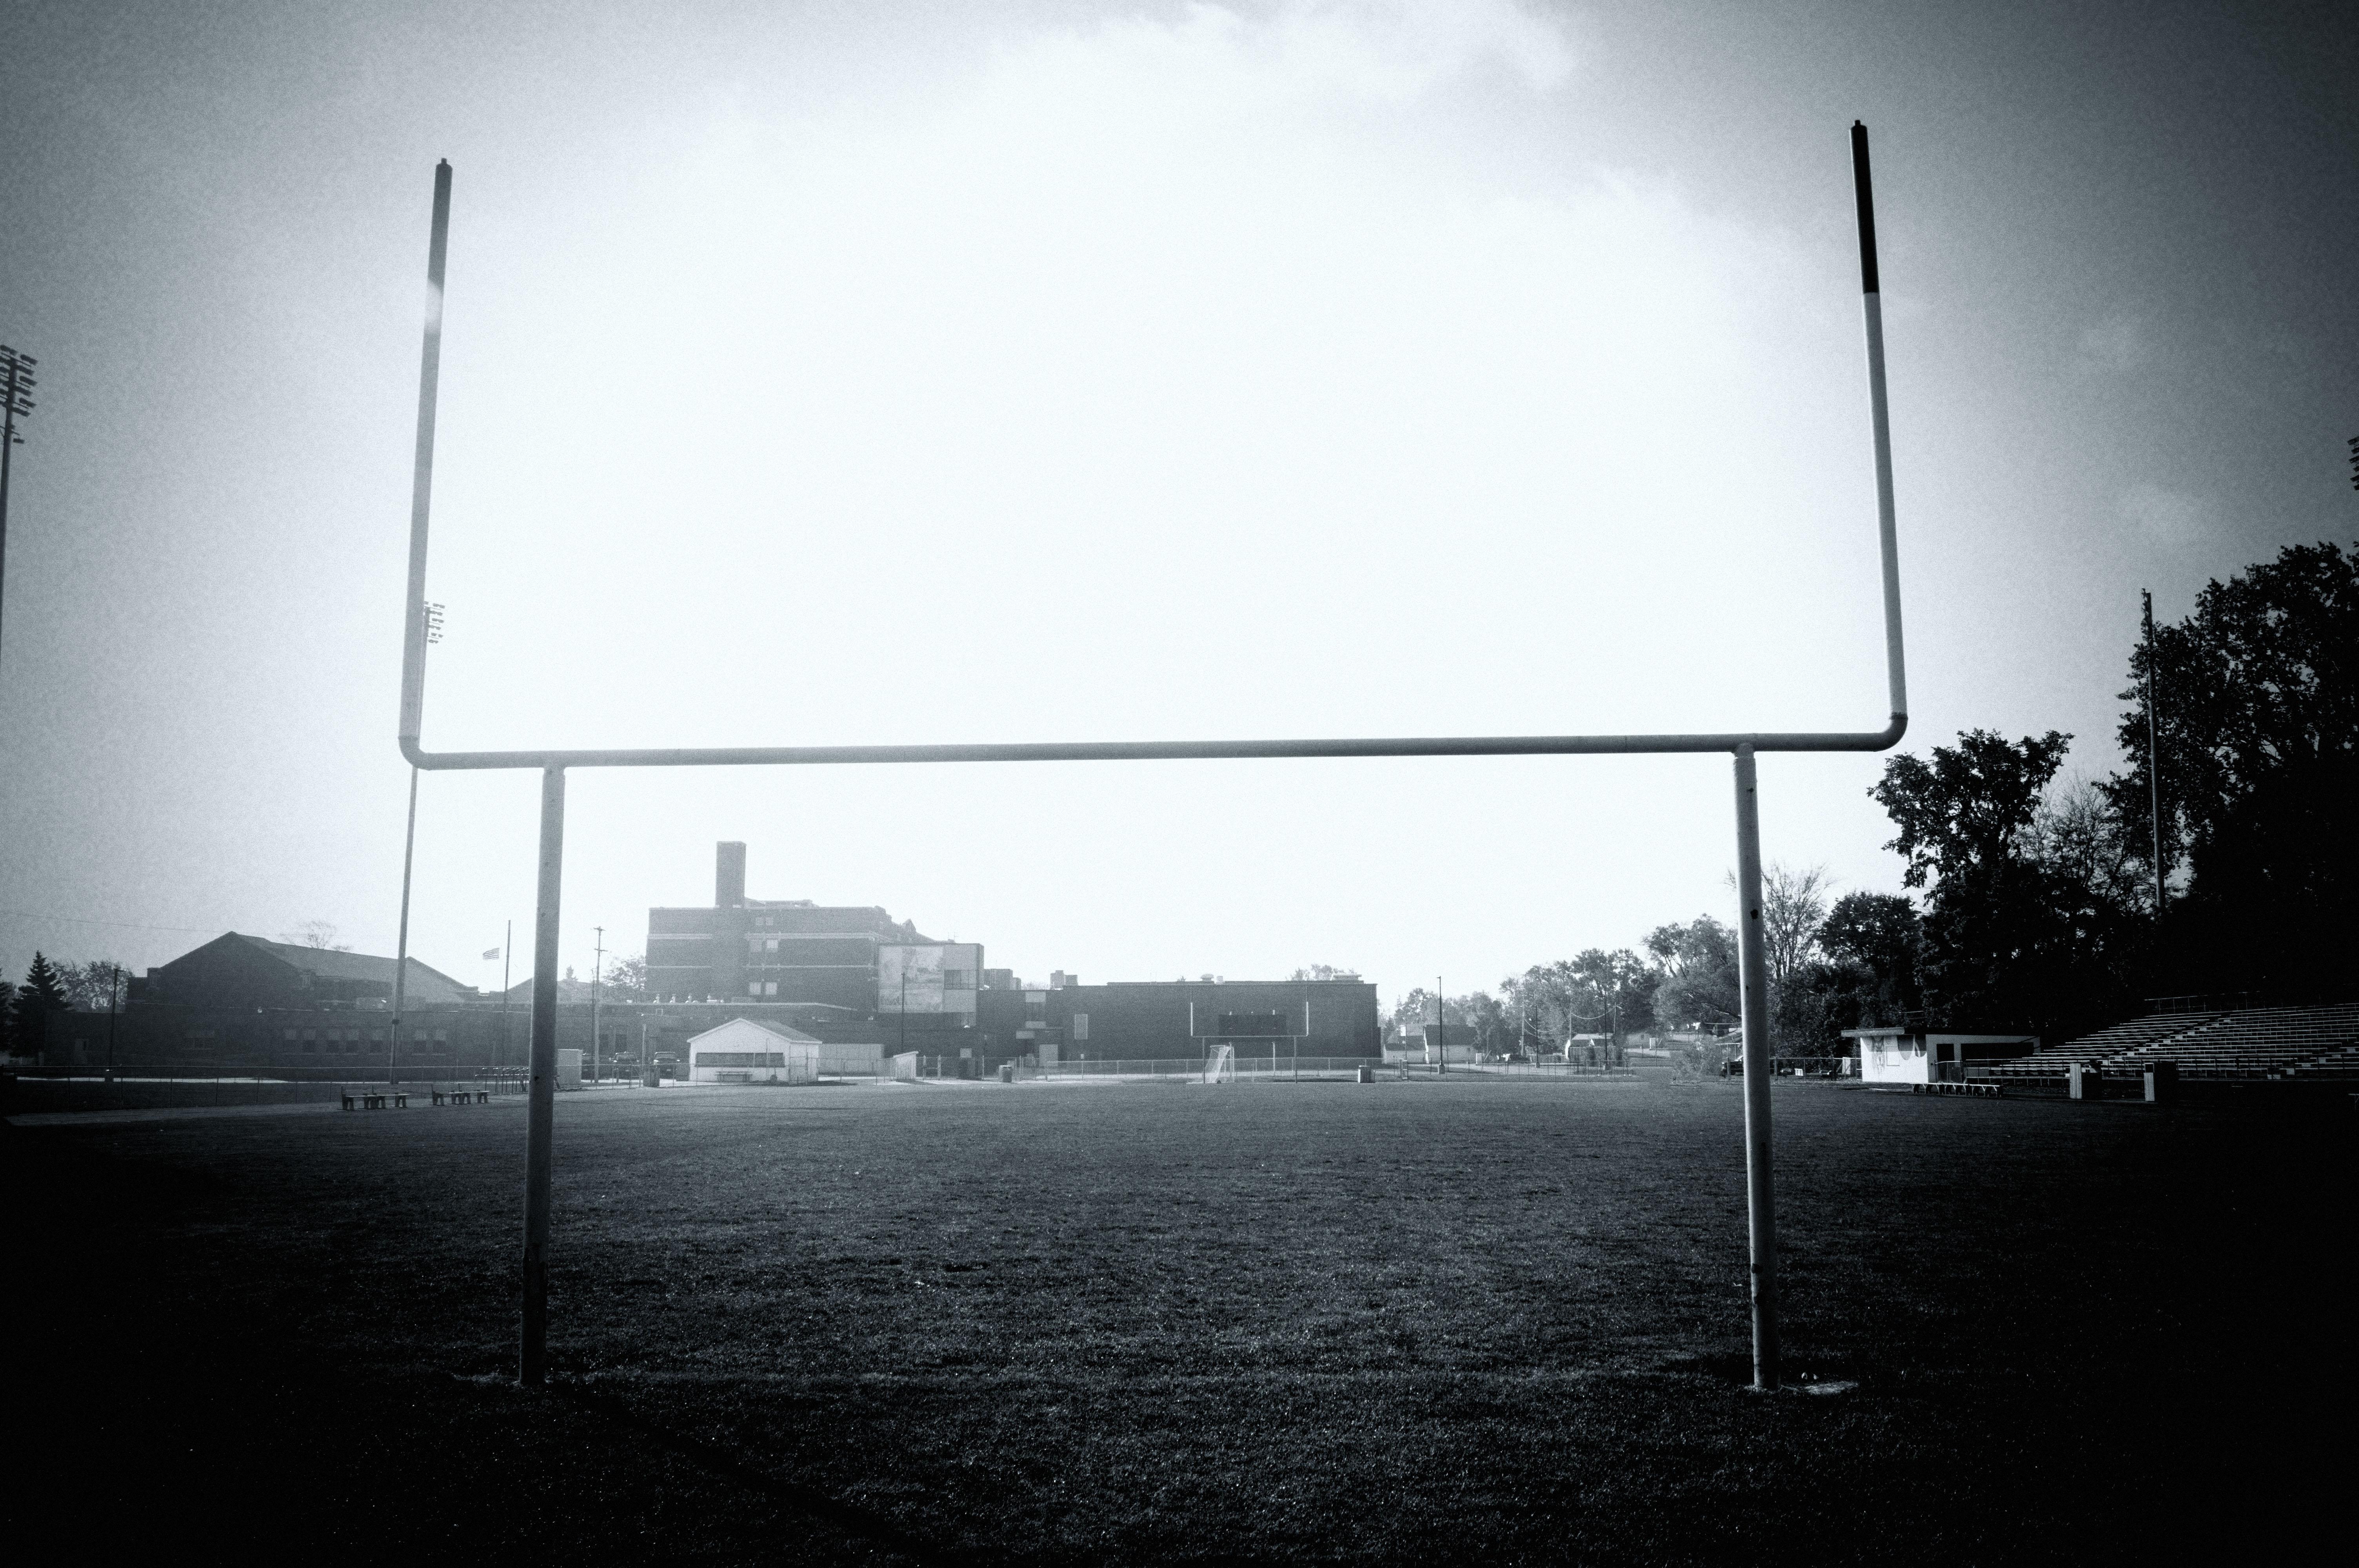 T.L. Handy Goal Post